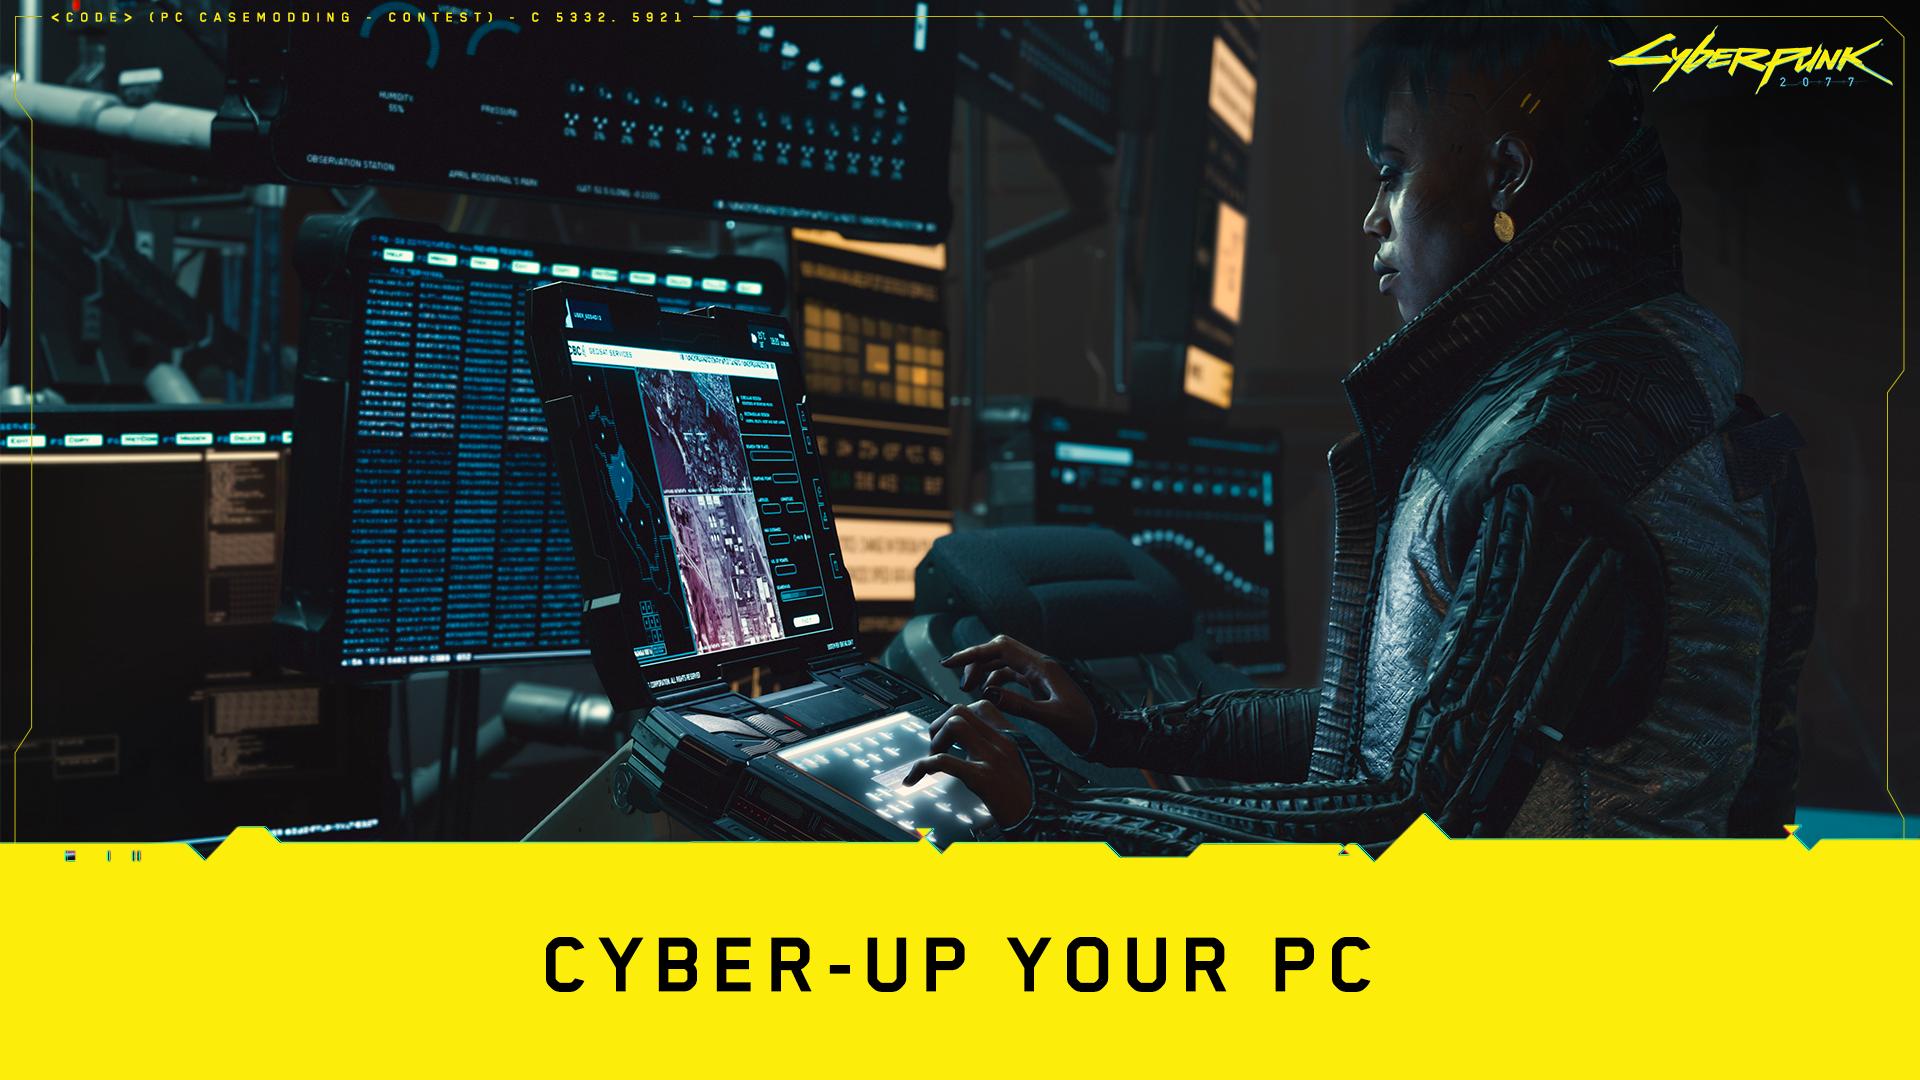 Cyberpunk 2077 | Concurso promove PC gamer dos sonhos